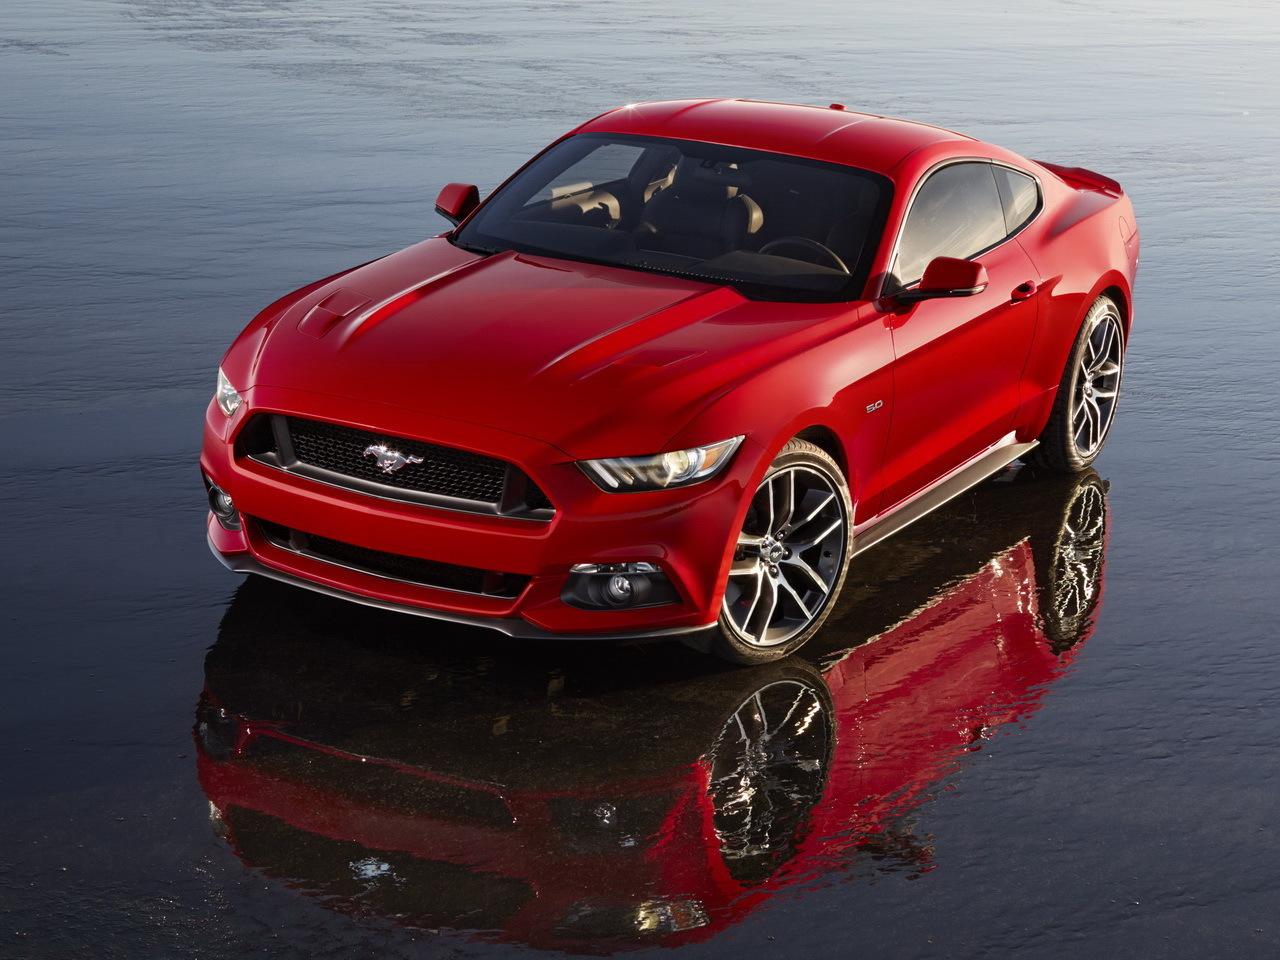 Ford Mustang : bientôt une boite à 10 rapports